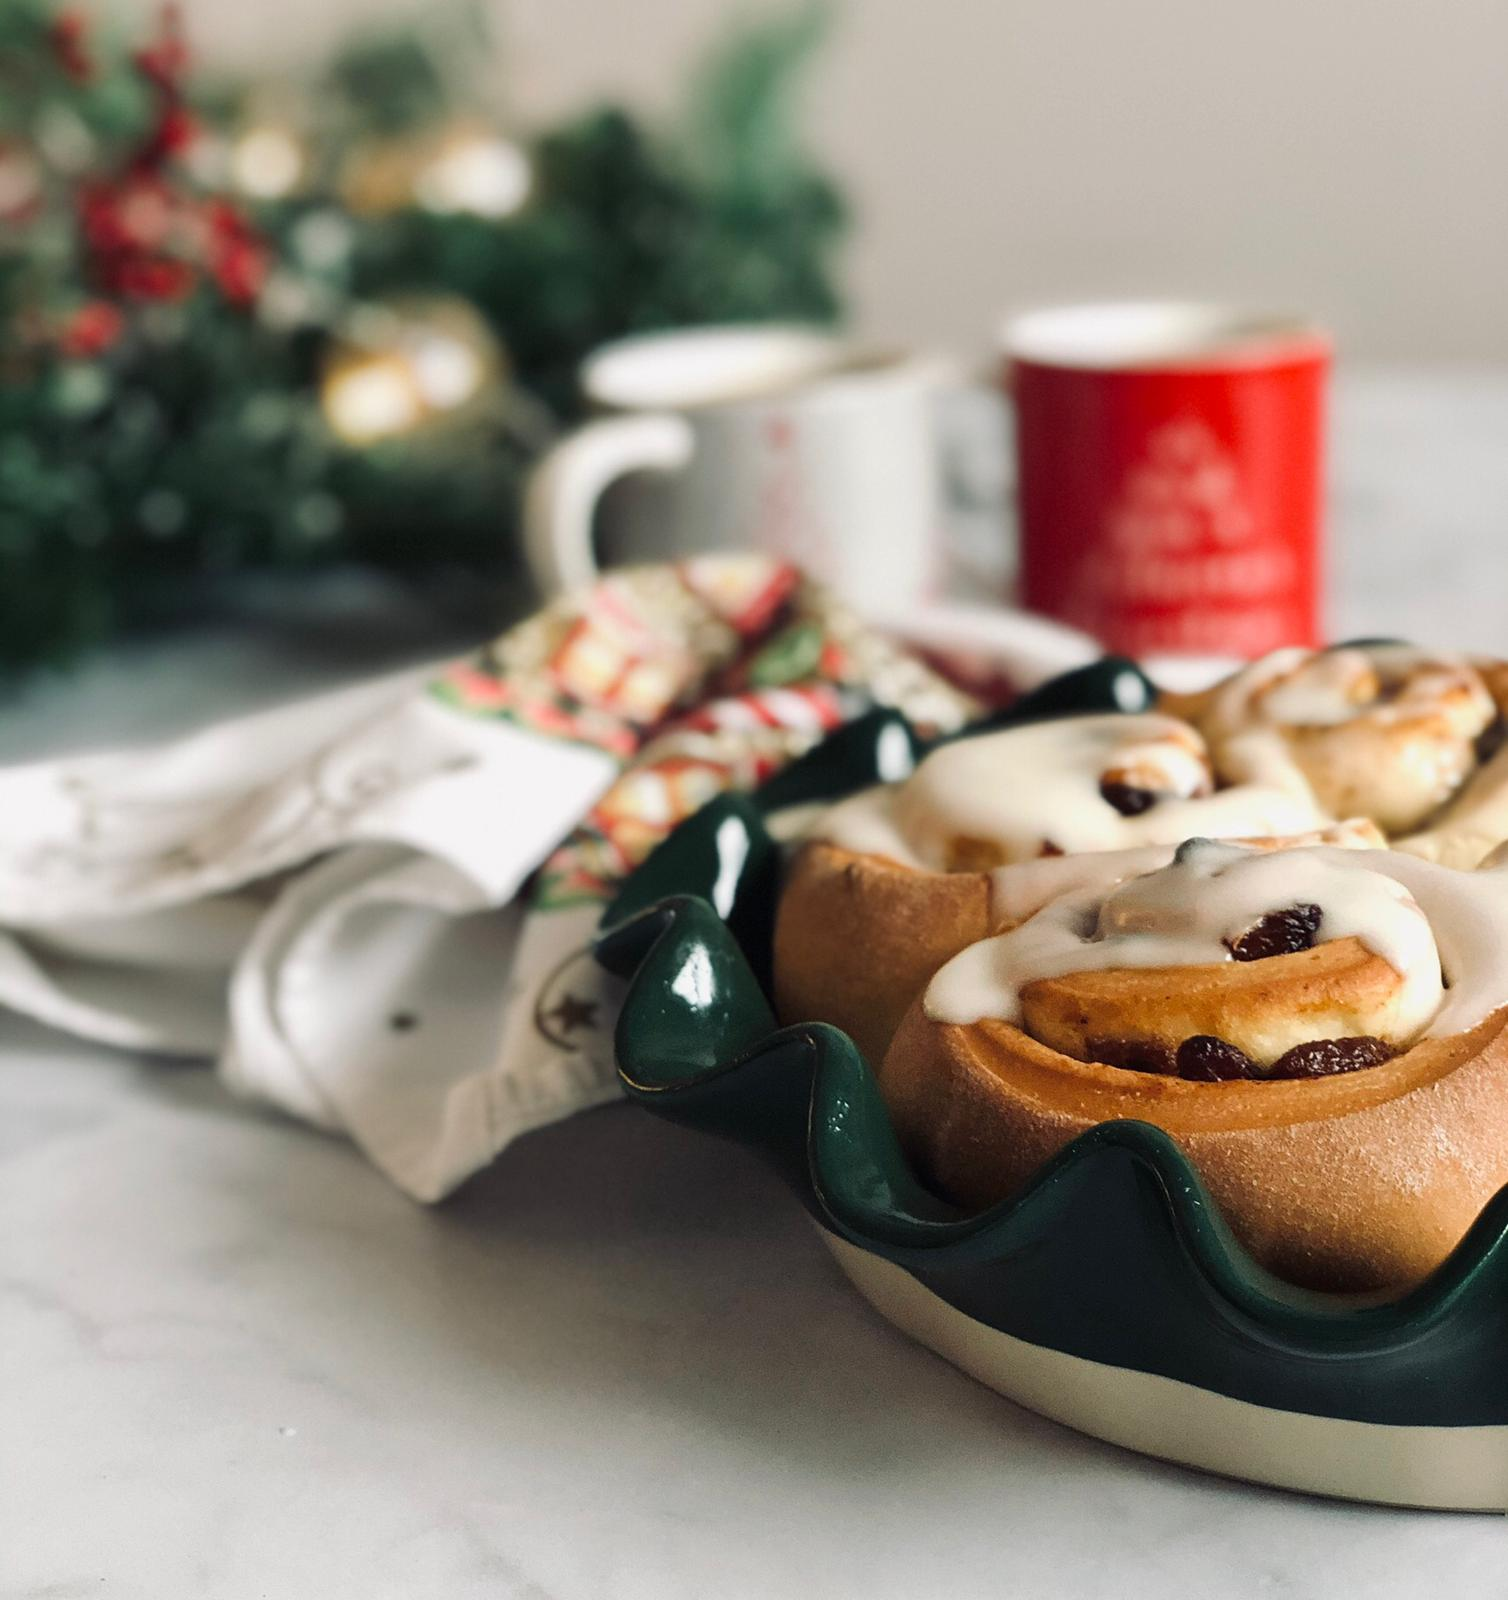 Mince Pie Cinnamon Rolls with coffee cups